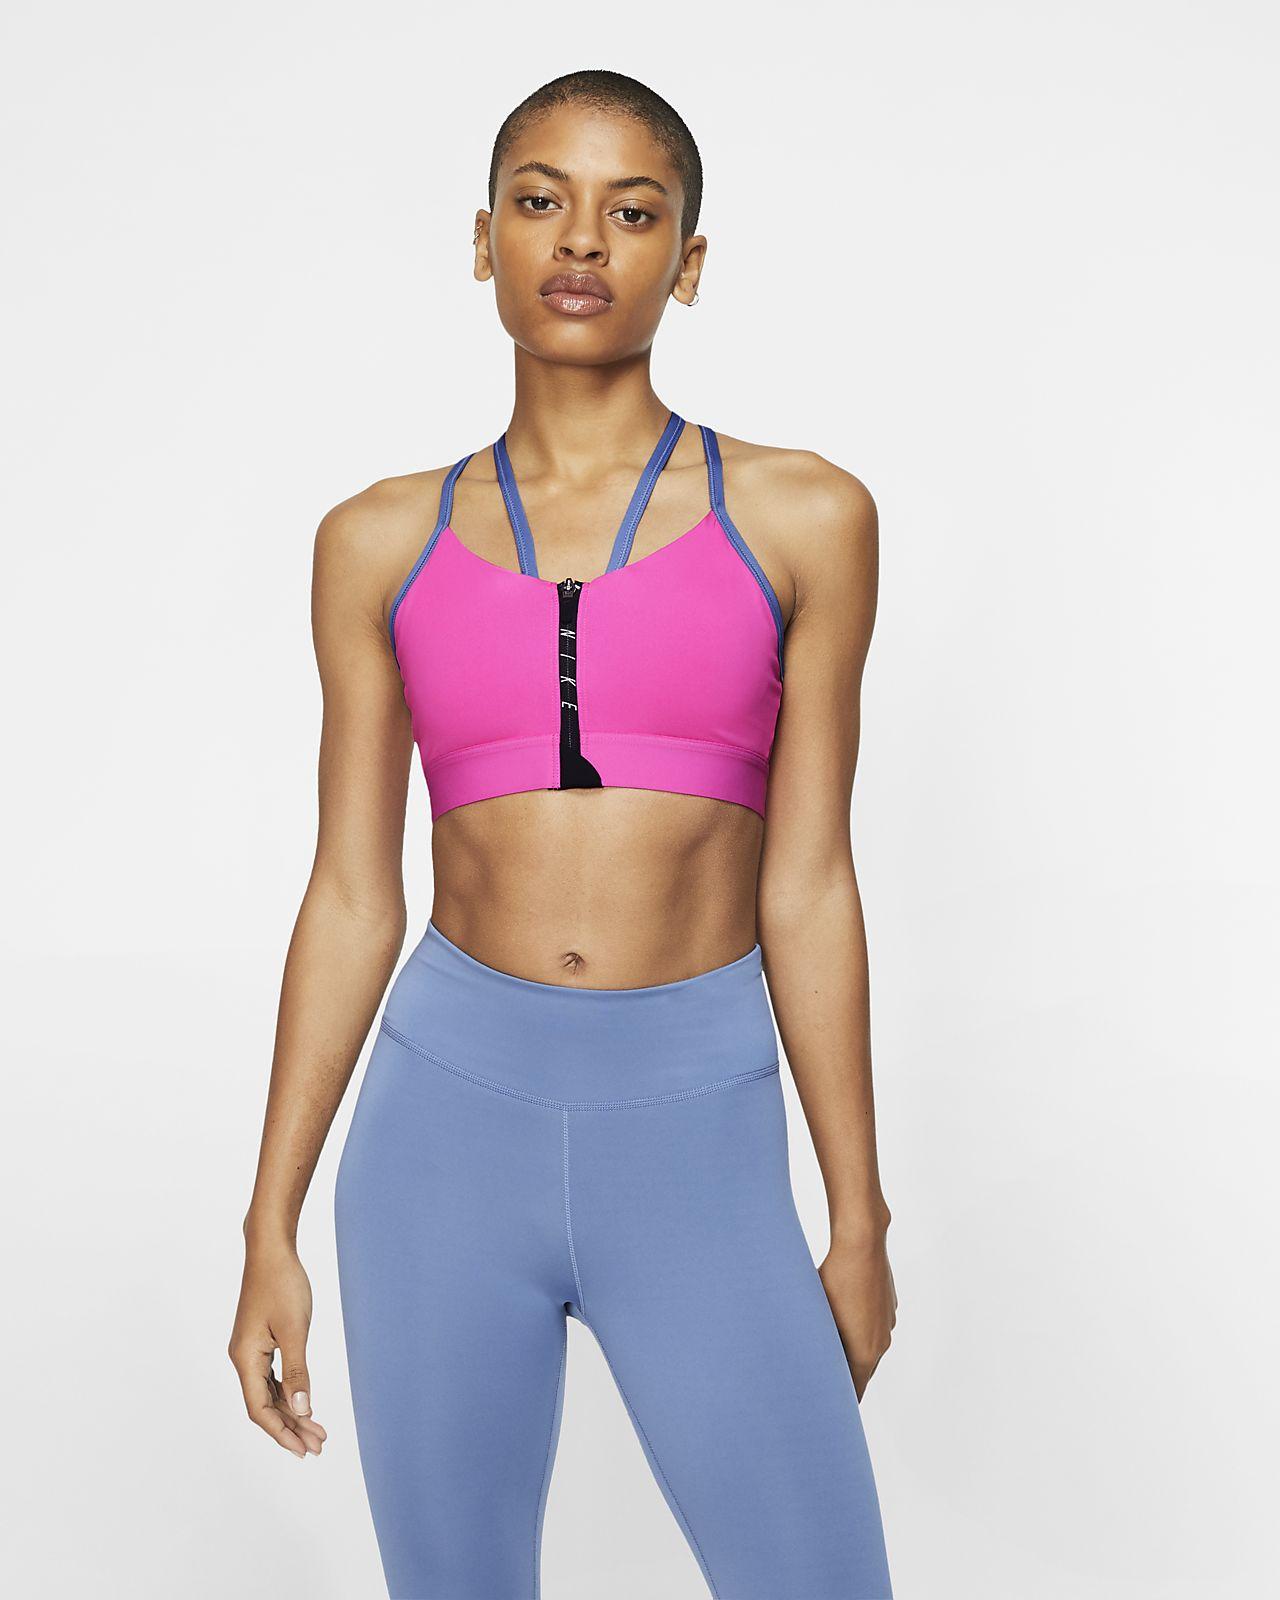 Nike Indy Women's Zip Light-Support Sports Bra